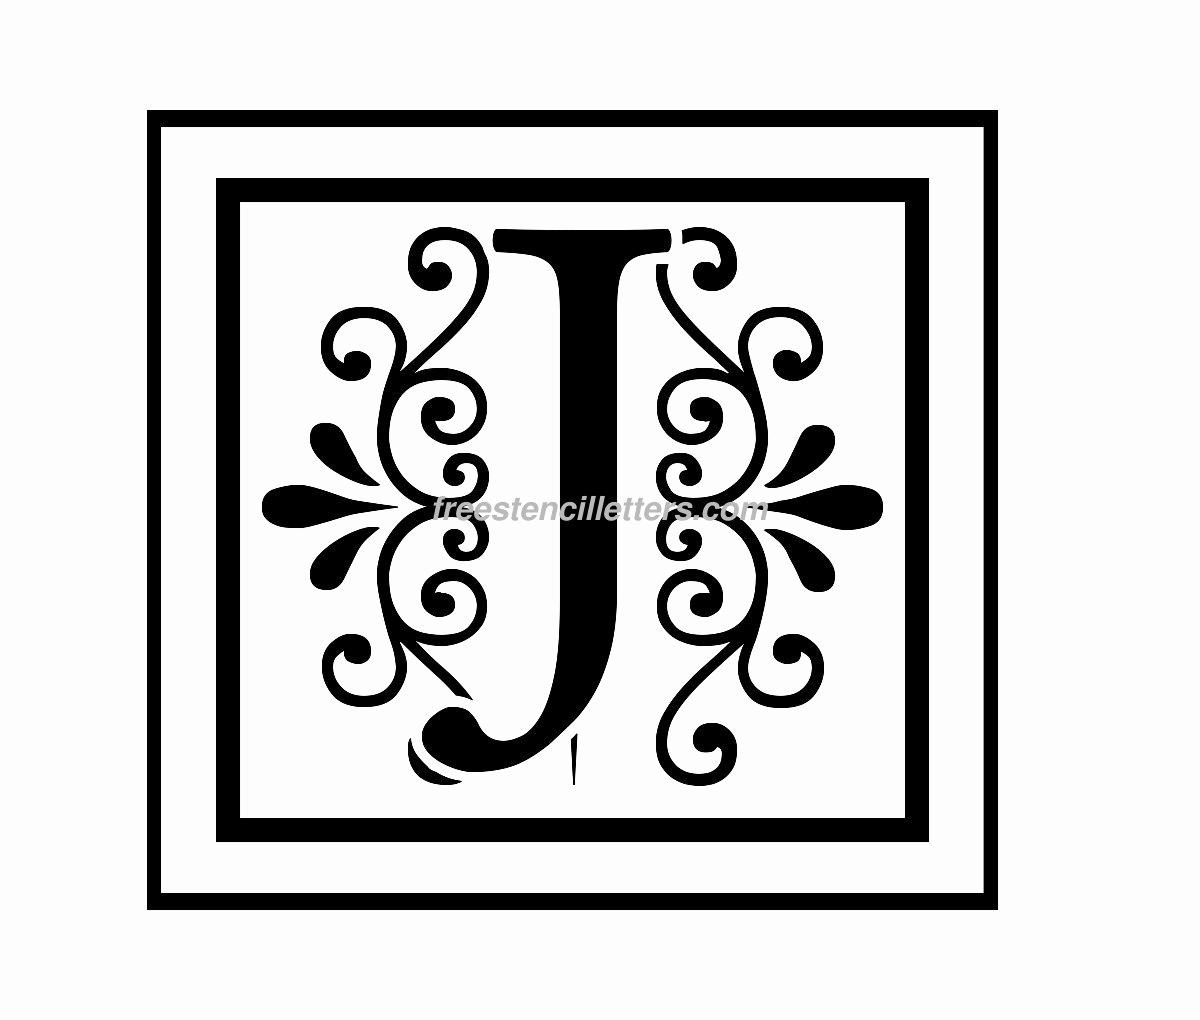 Free Printable Alphabet Stencils Unique Monogram Stencil Letters Archives Free Stencil Letters